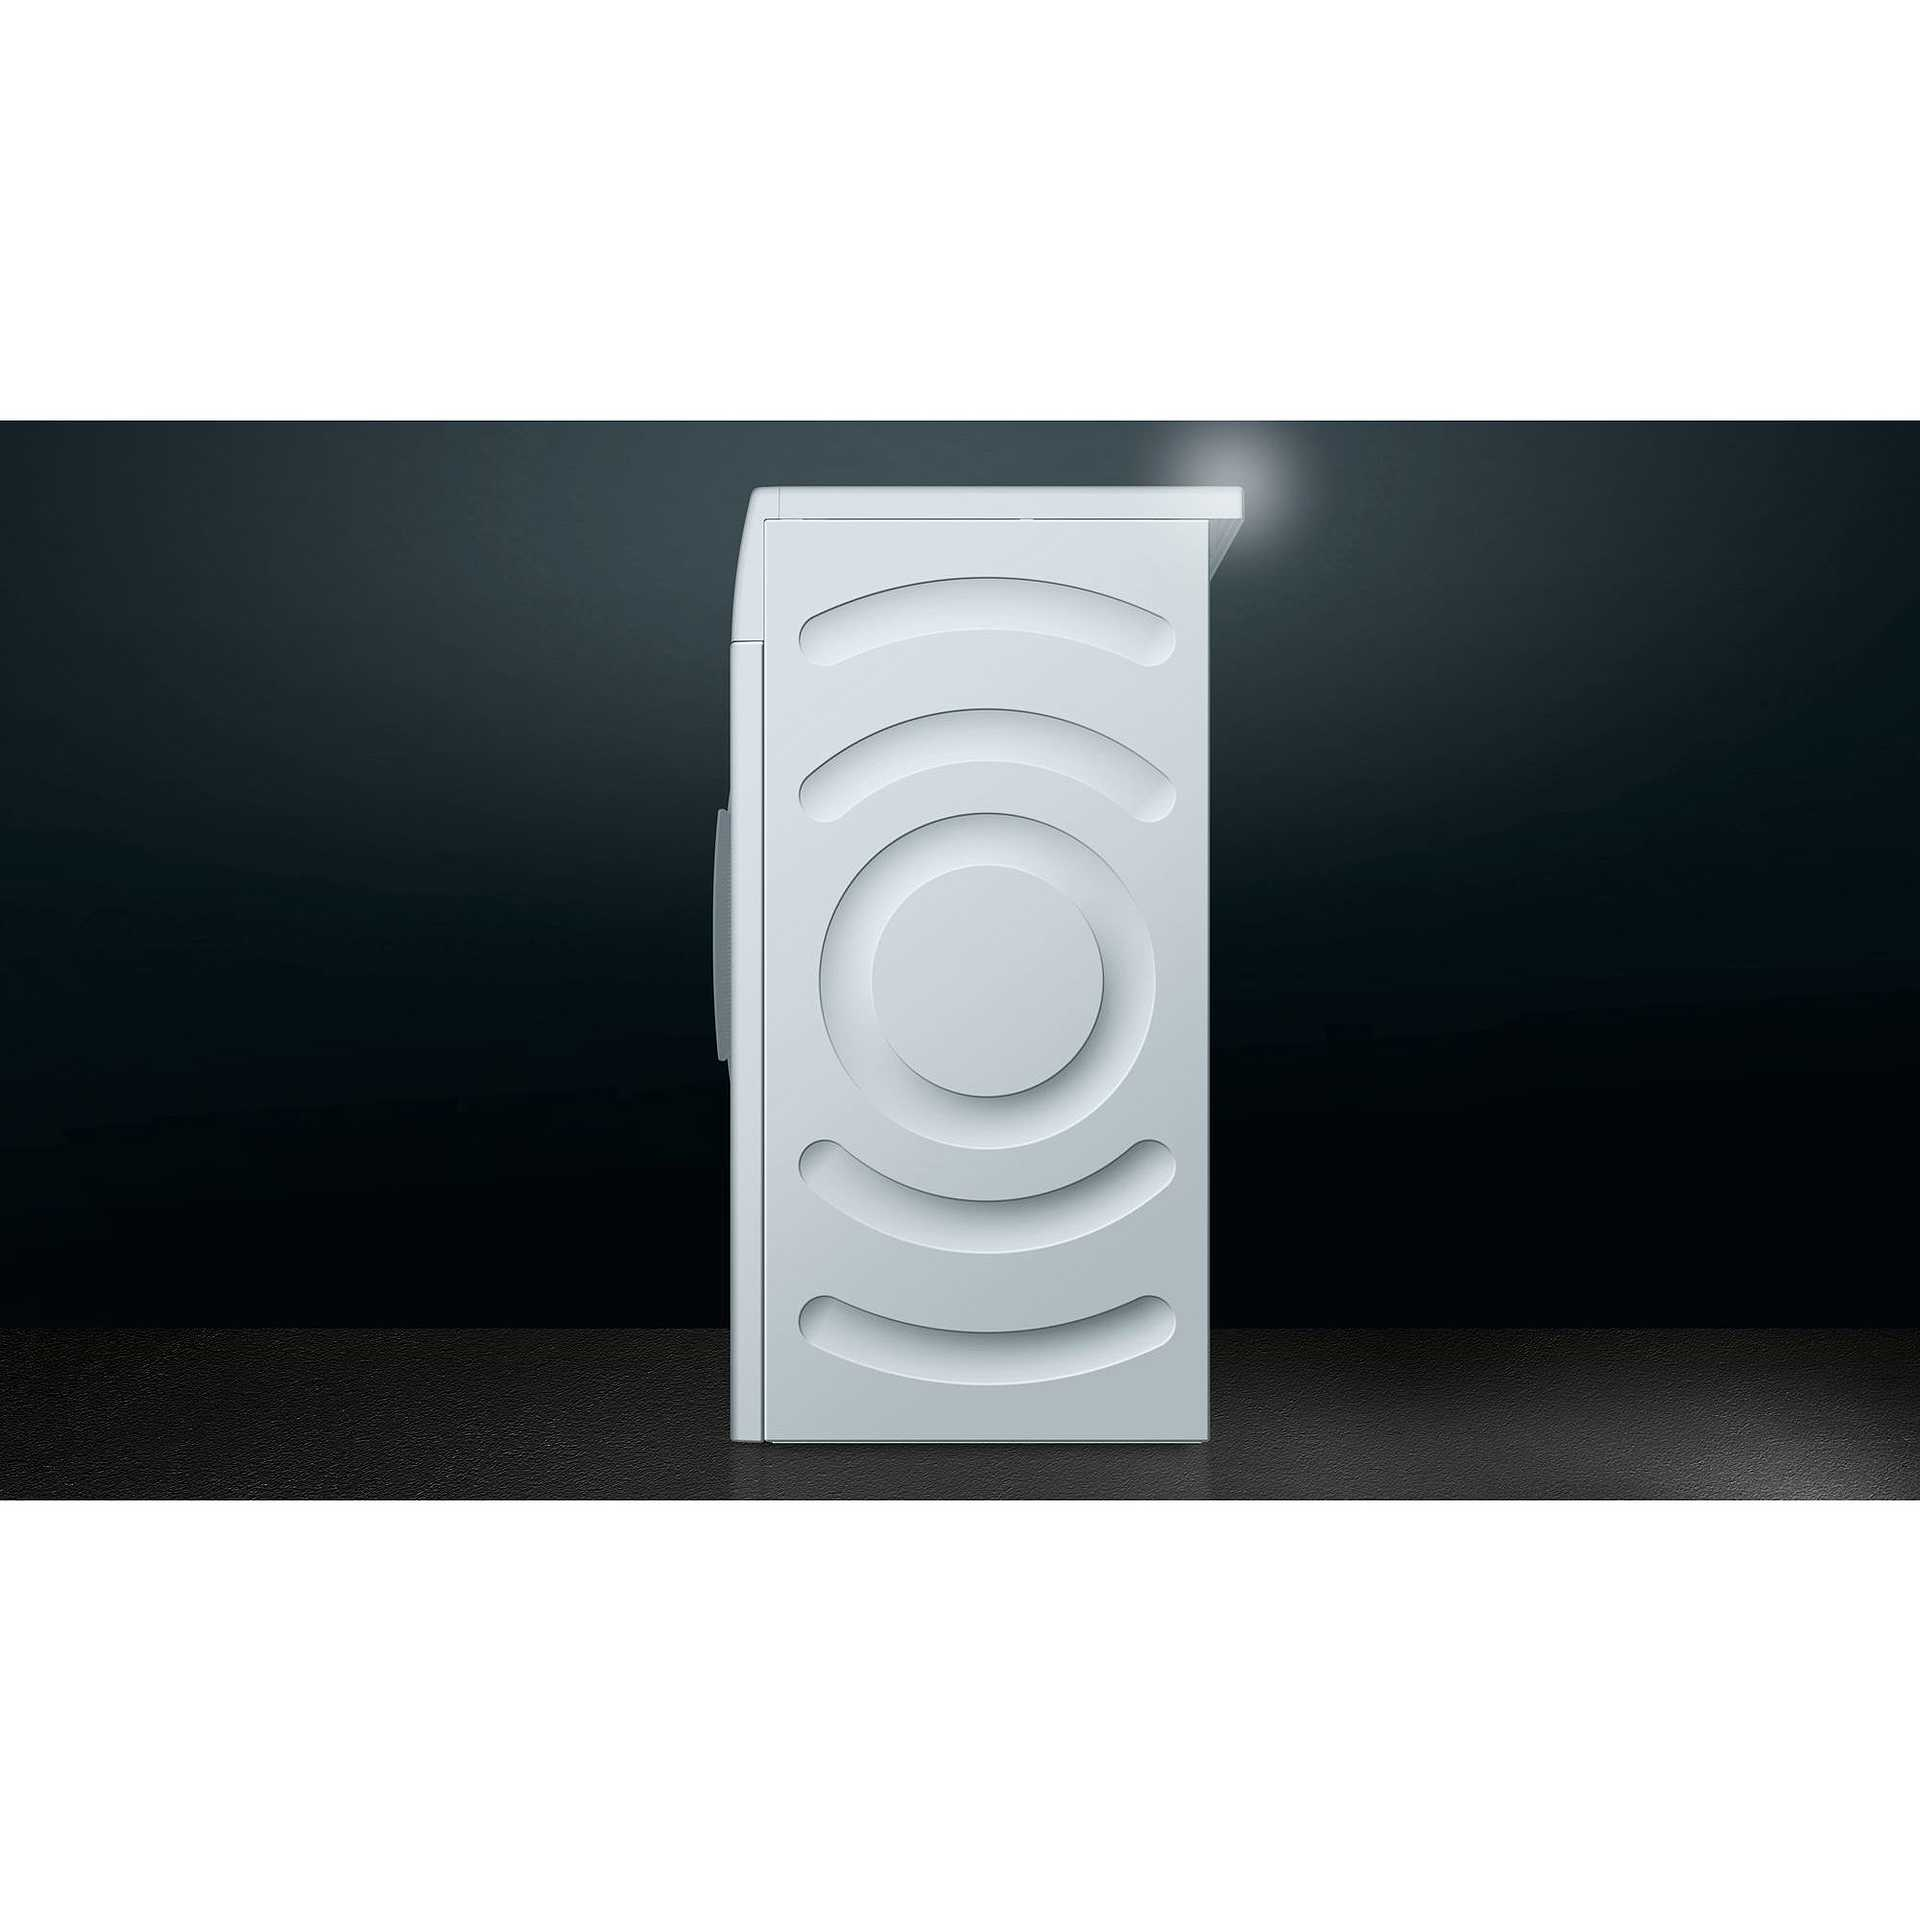 Siemens Ws10t447it Lavatrice 45 Cm Carica Frontale 6 5 Kg